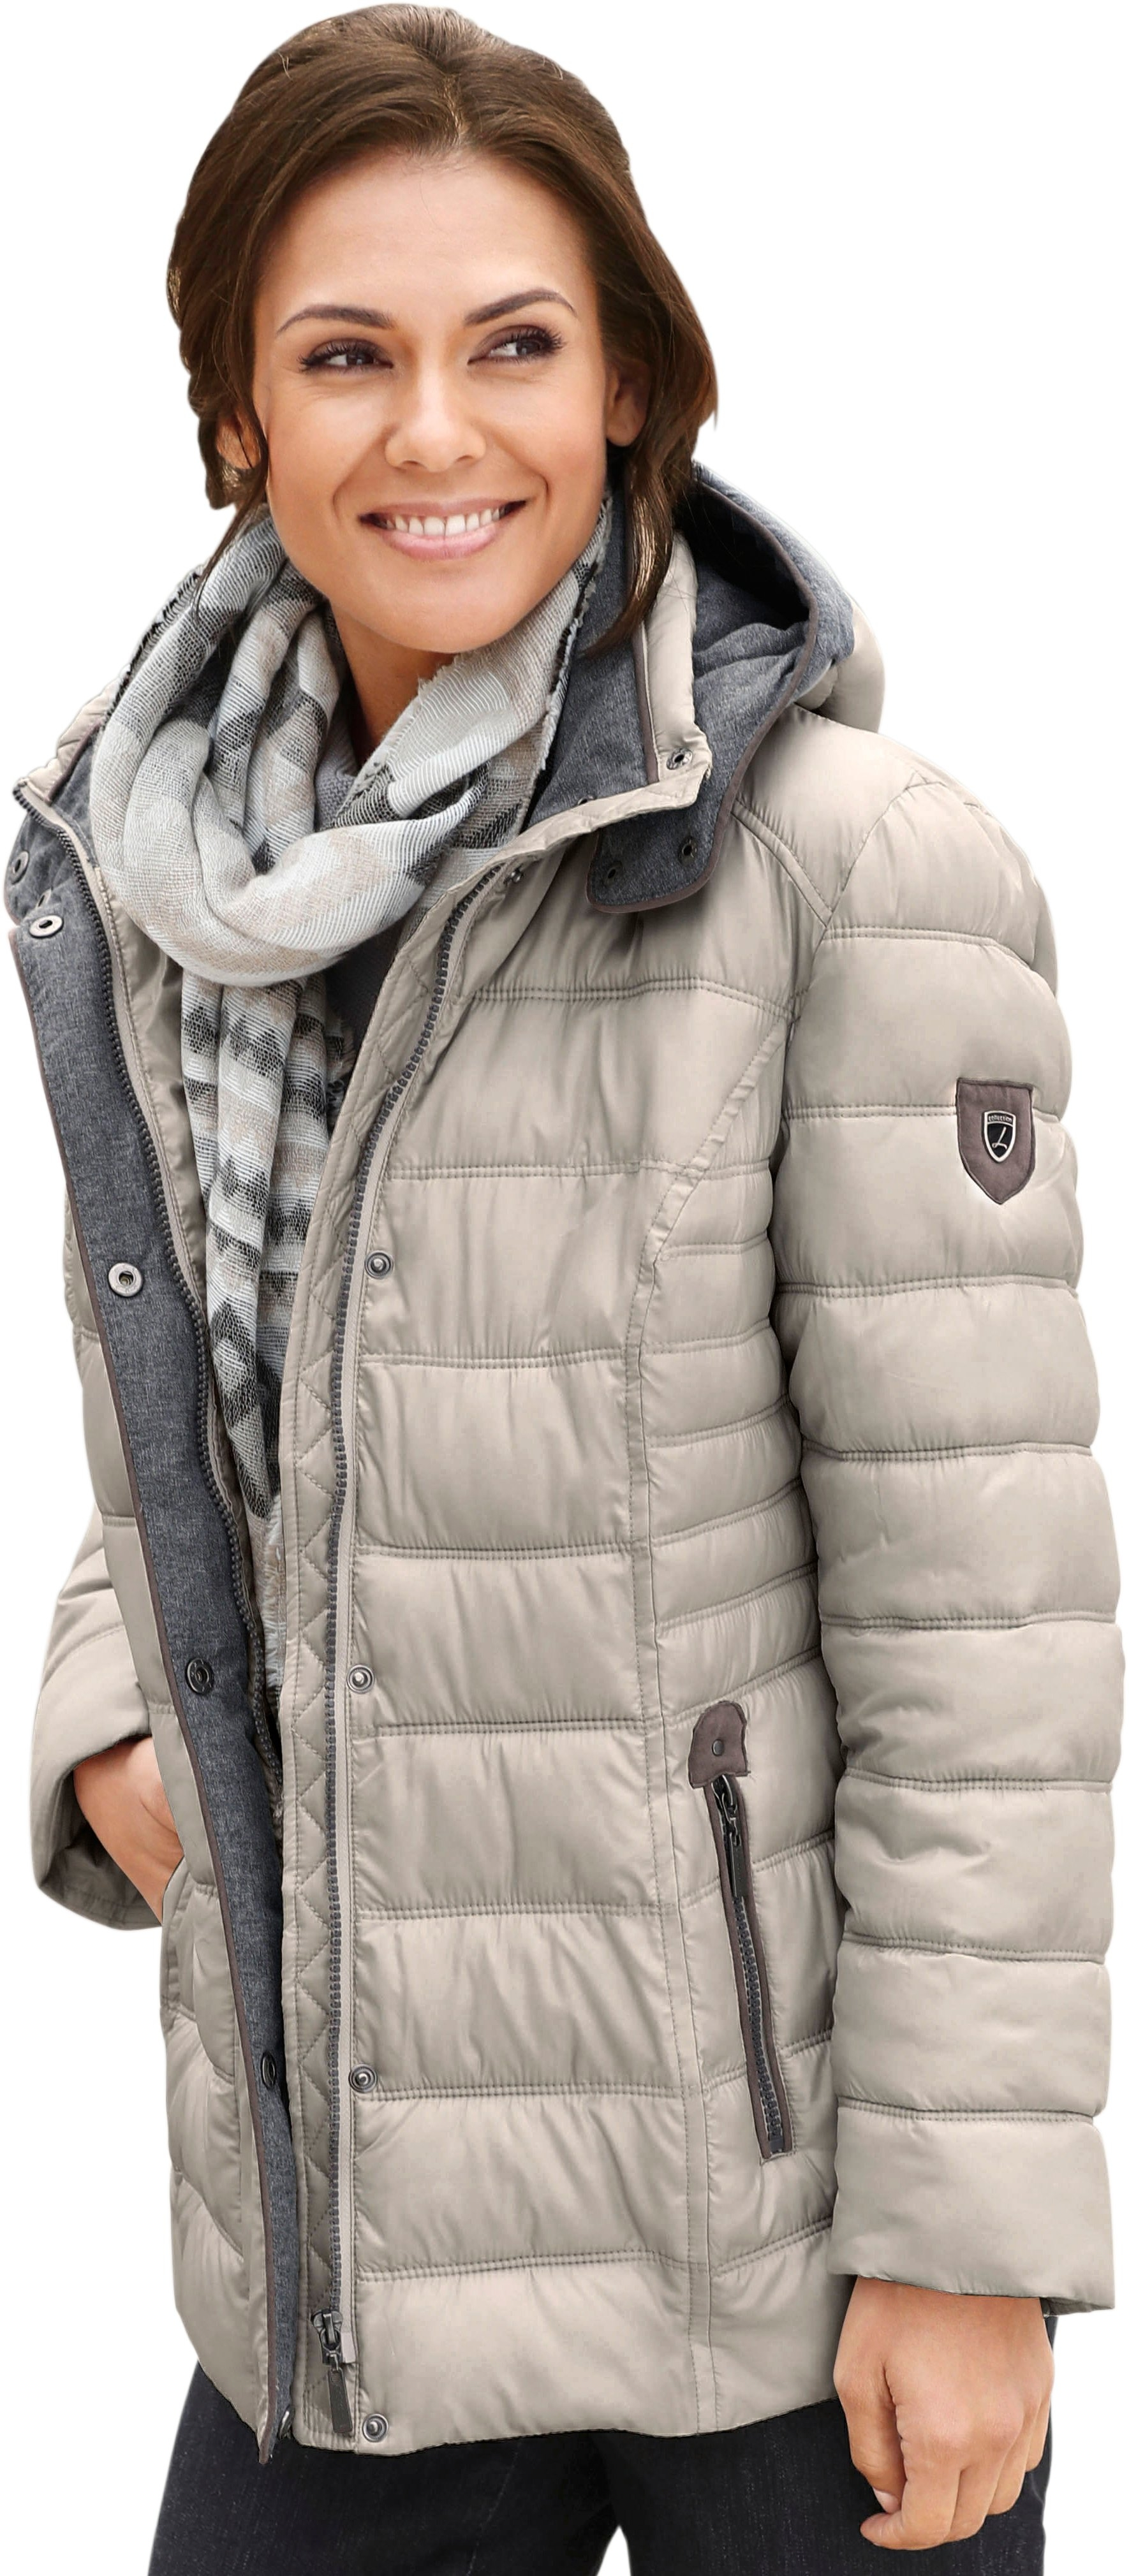 Casual Looks jas met sportief stikselmotief - verschillende betaalmethodes